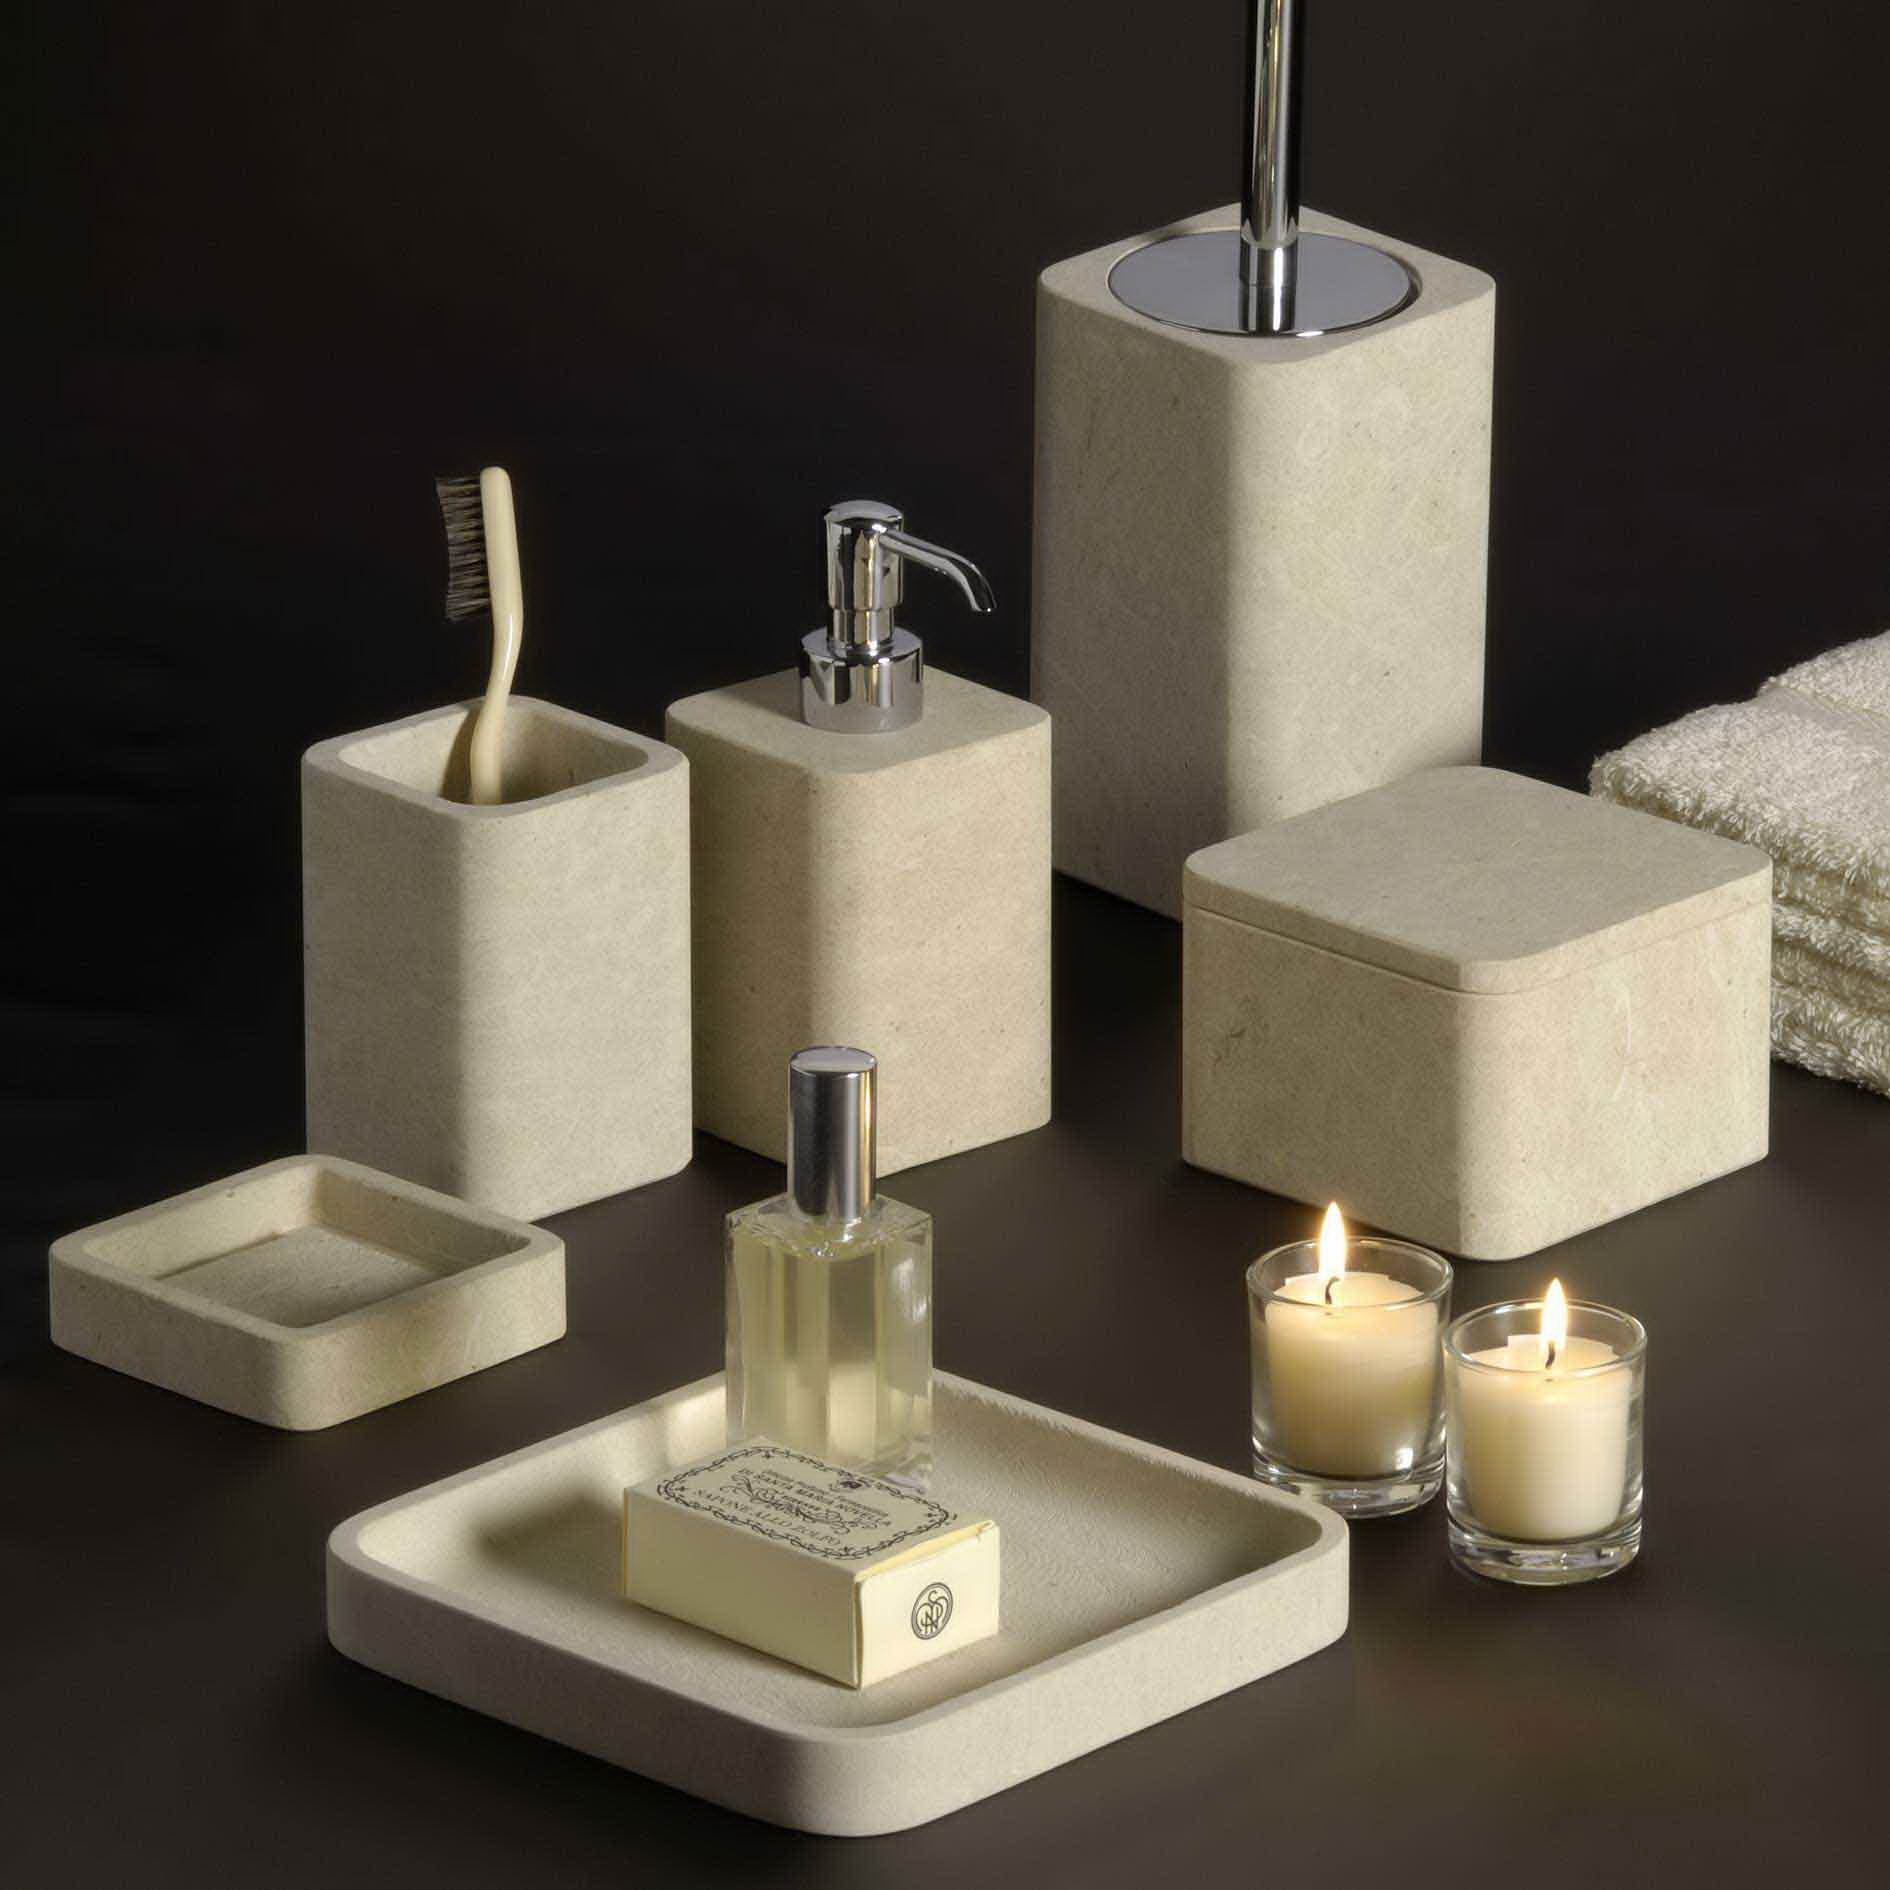 Ustensile de salle de bain 49084 salle de bain id es for Accessoires salle de bain fly